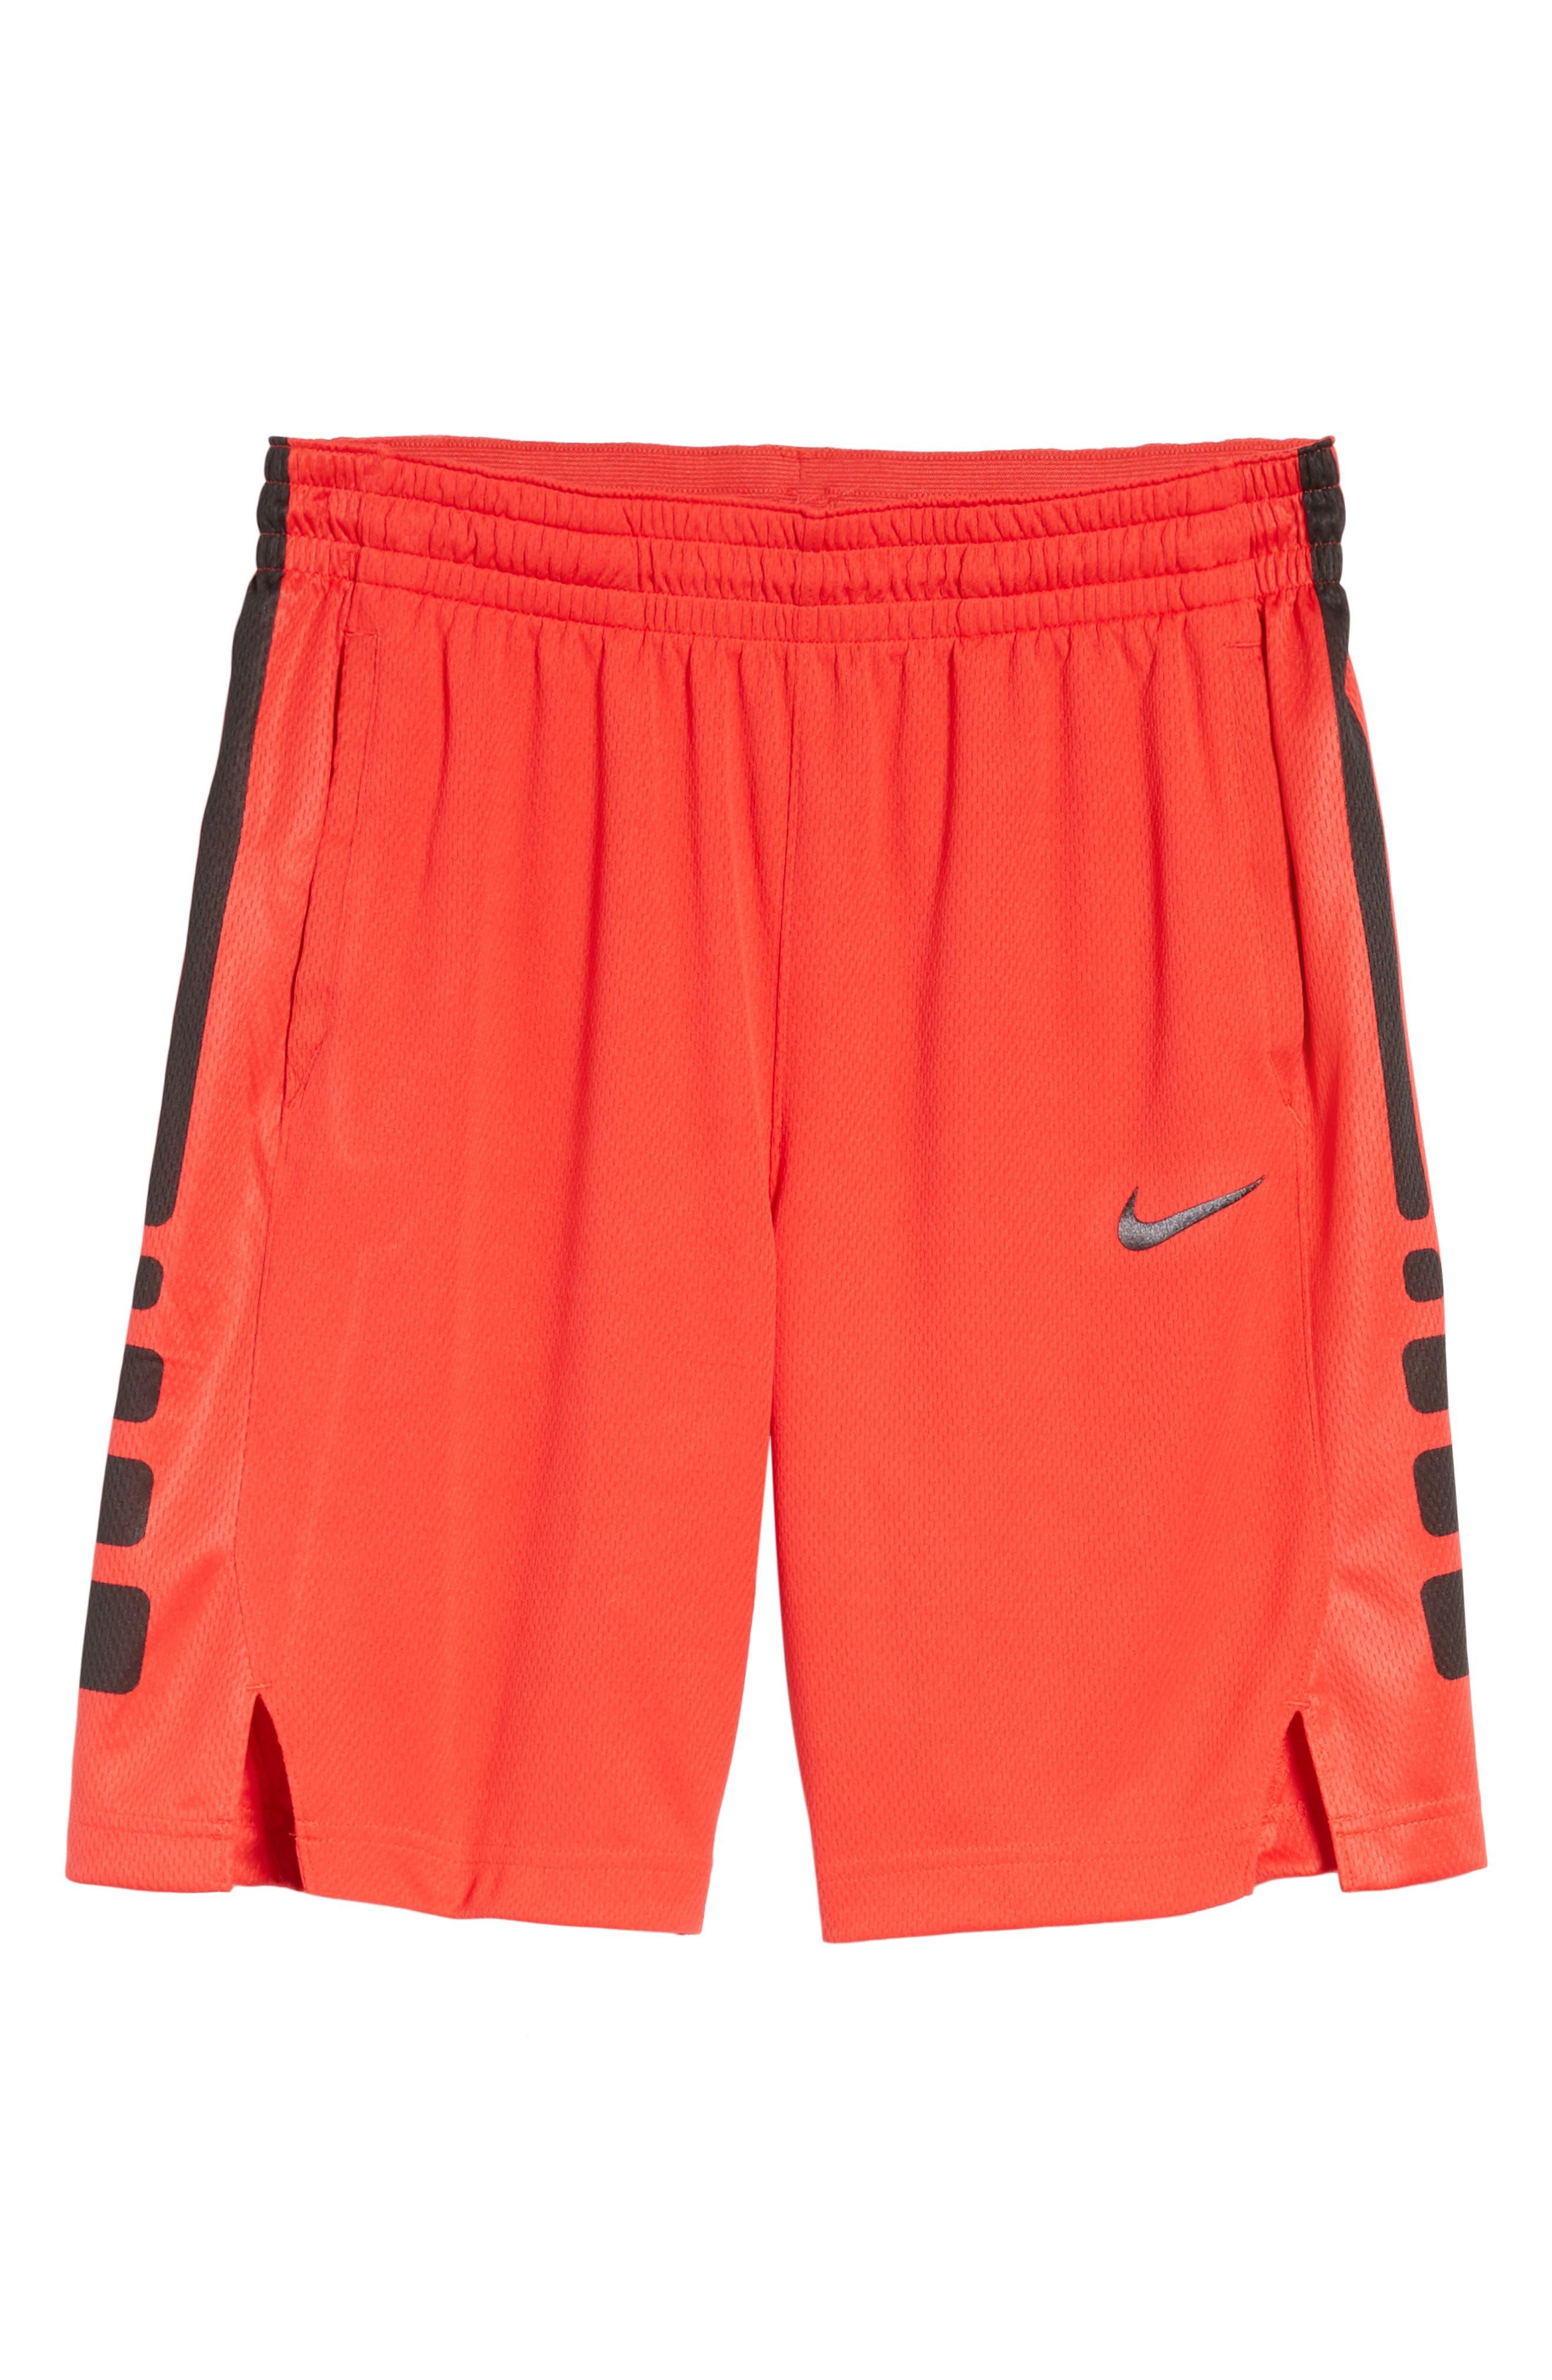 Elite Stripe Basketball Shorts,                             Alternate thumbnail 6, color,                             UNIVERSITY RED/ BLACK